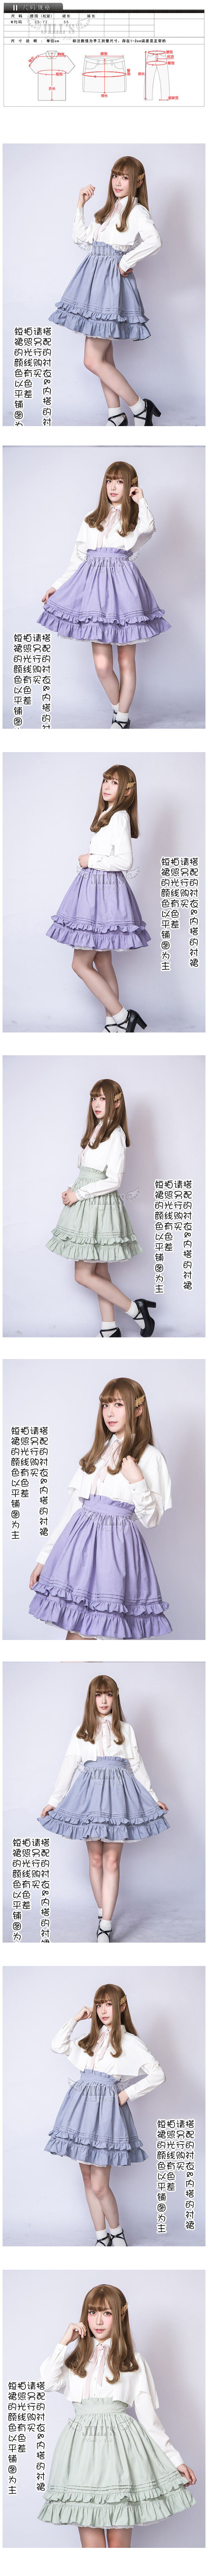 lolita princess diary houndstooth chidori print zippered jumper skirt【JHU0046】